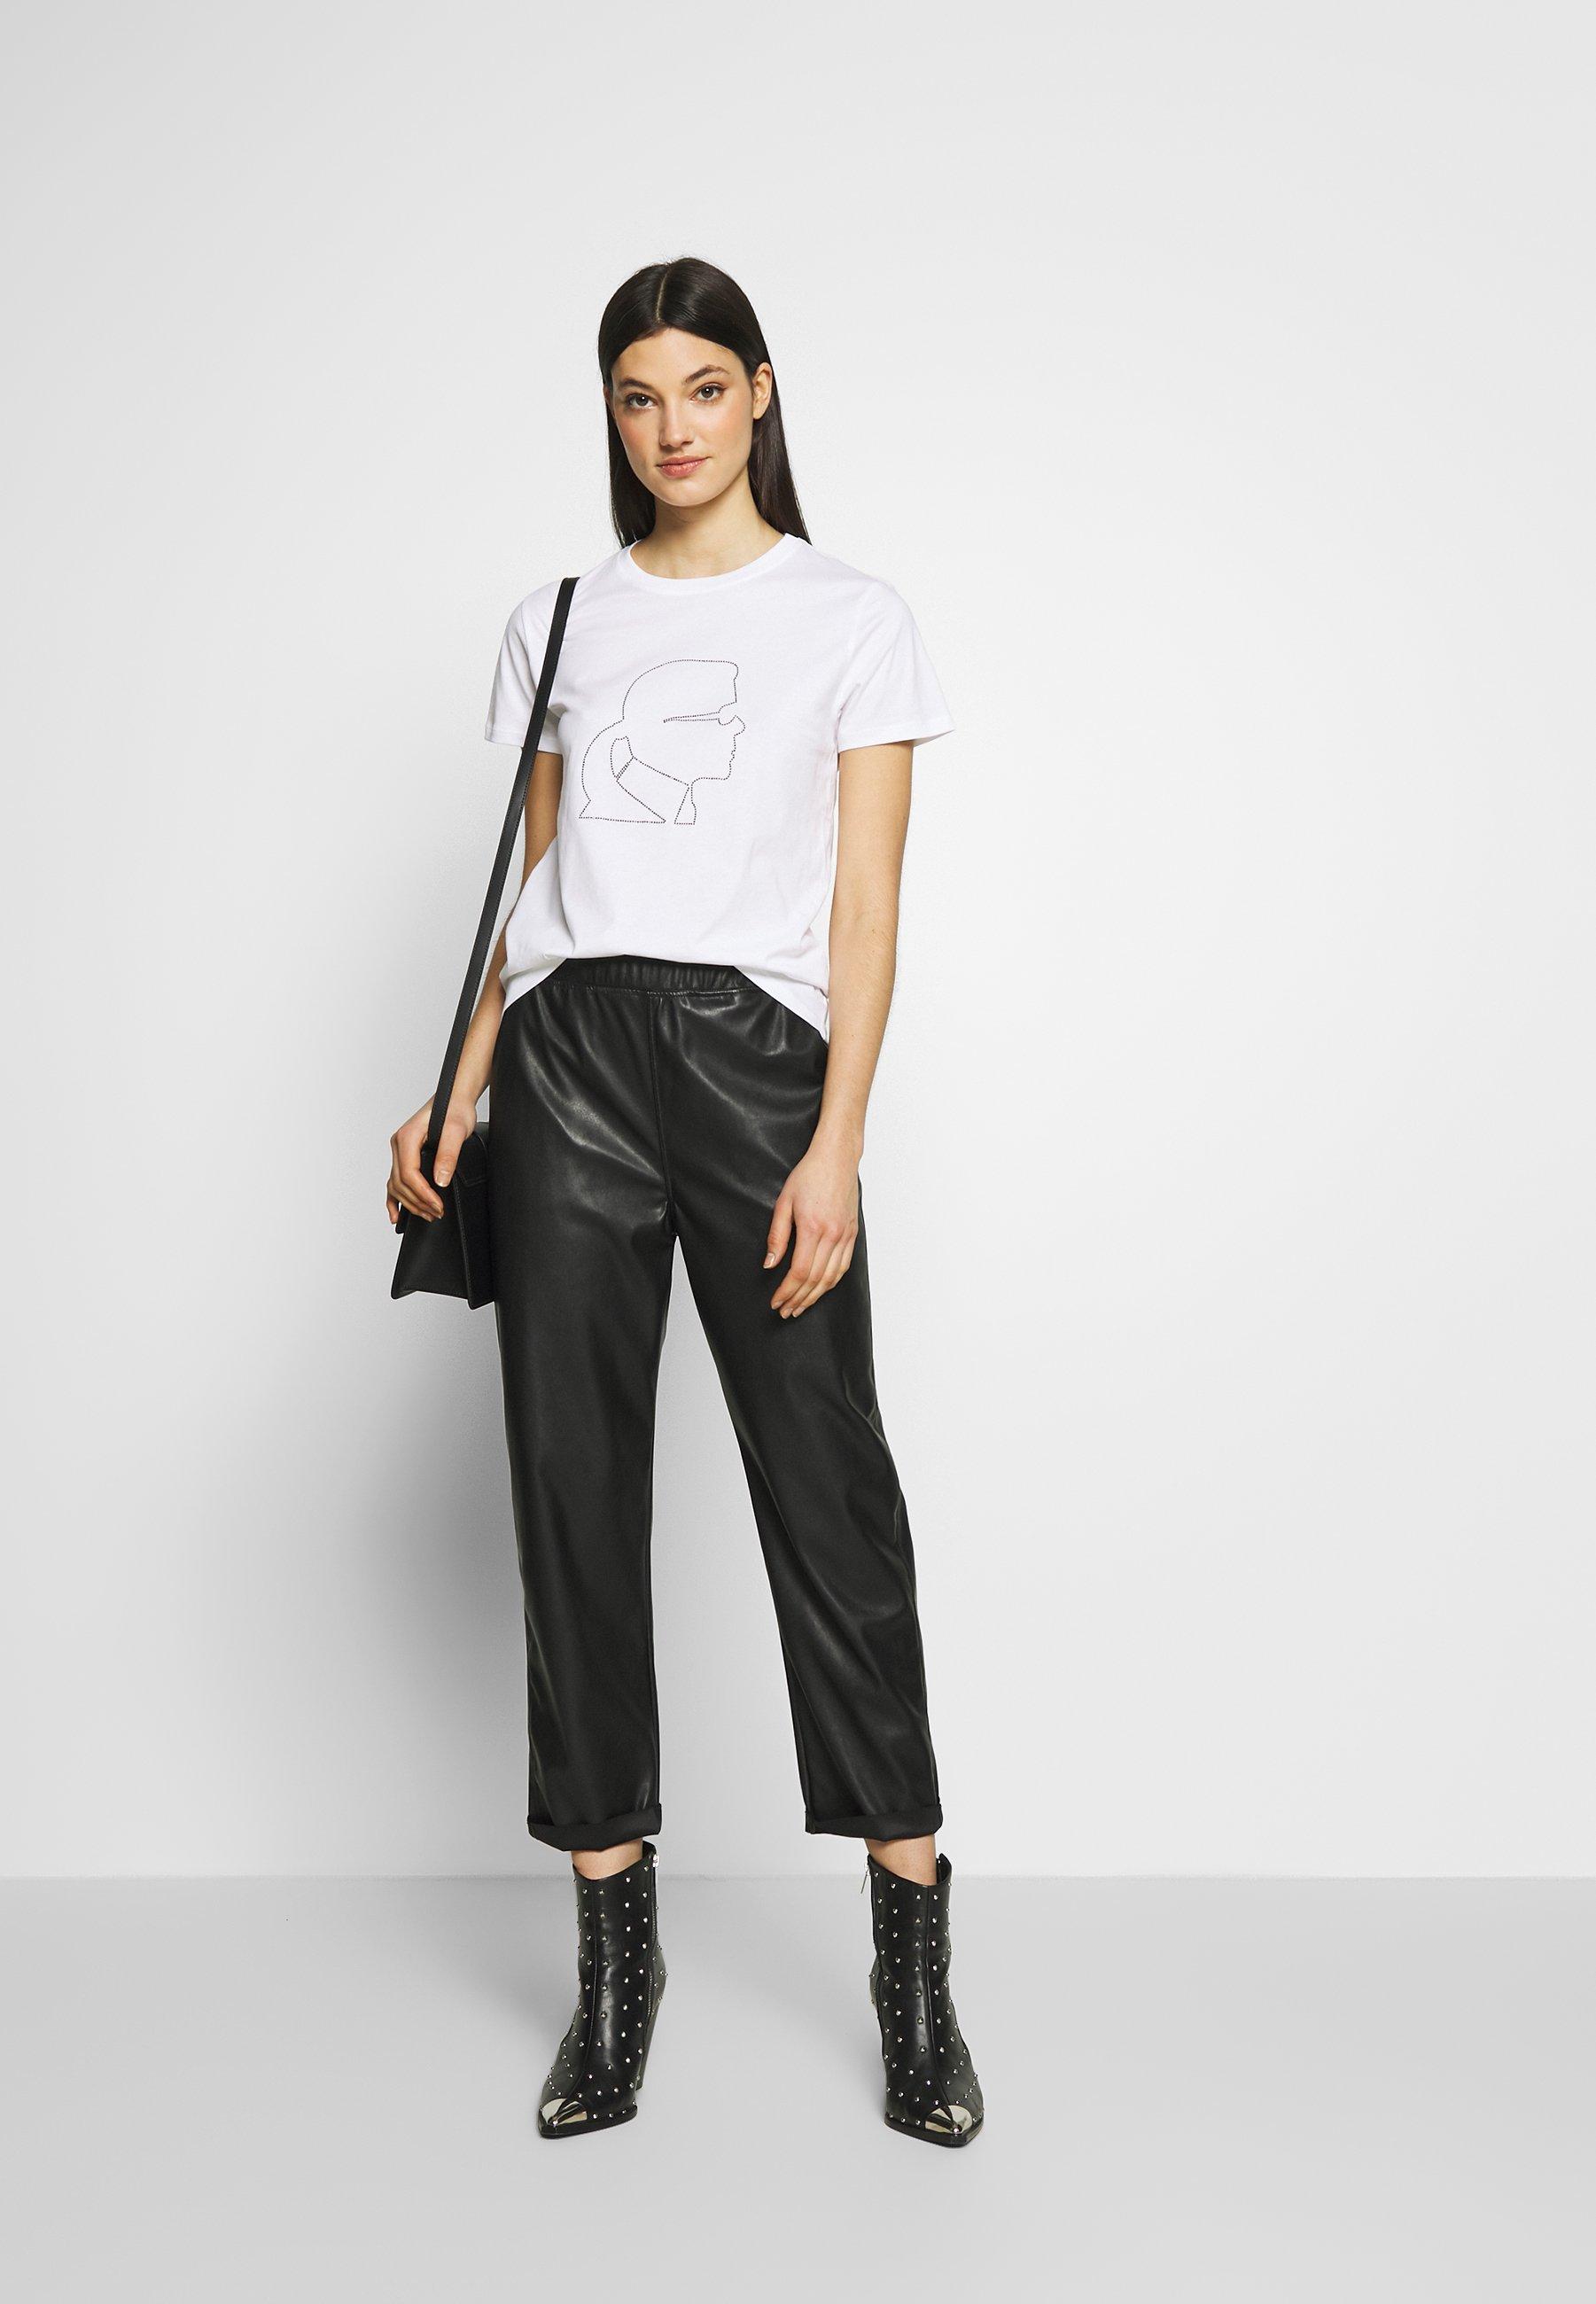 Karl Lagerfeld Profile Rhinestone Tee - T-shirt Print White Black Friday